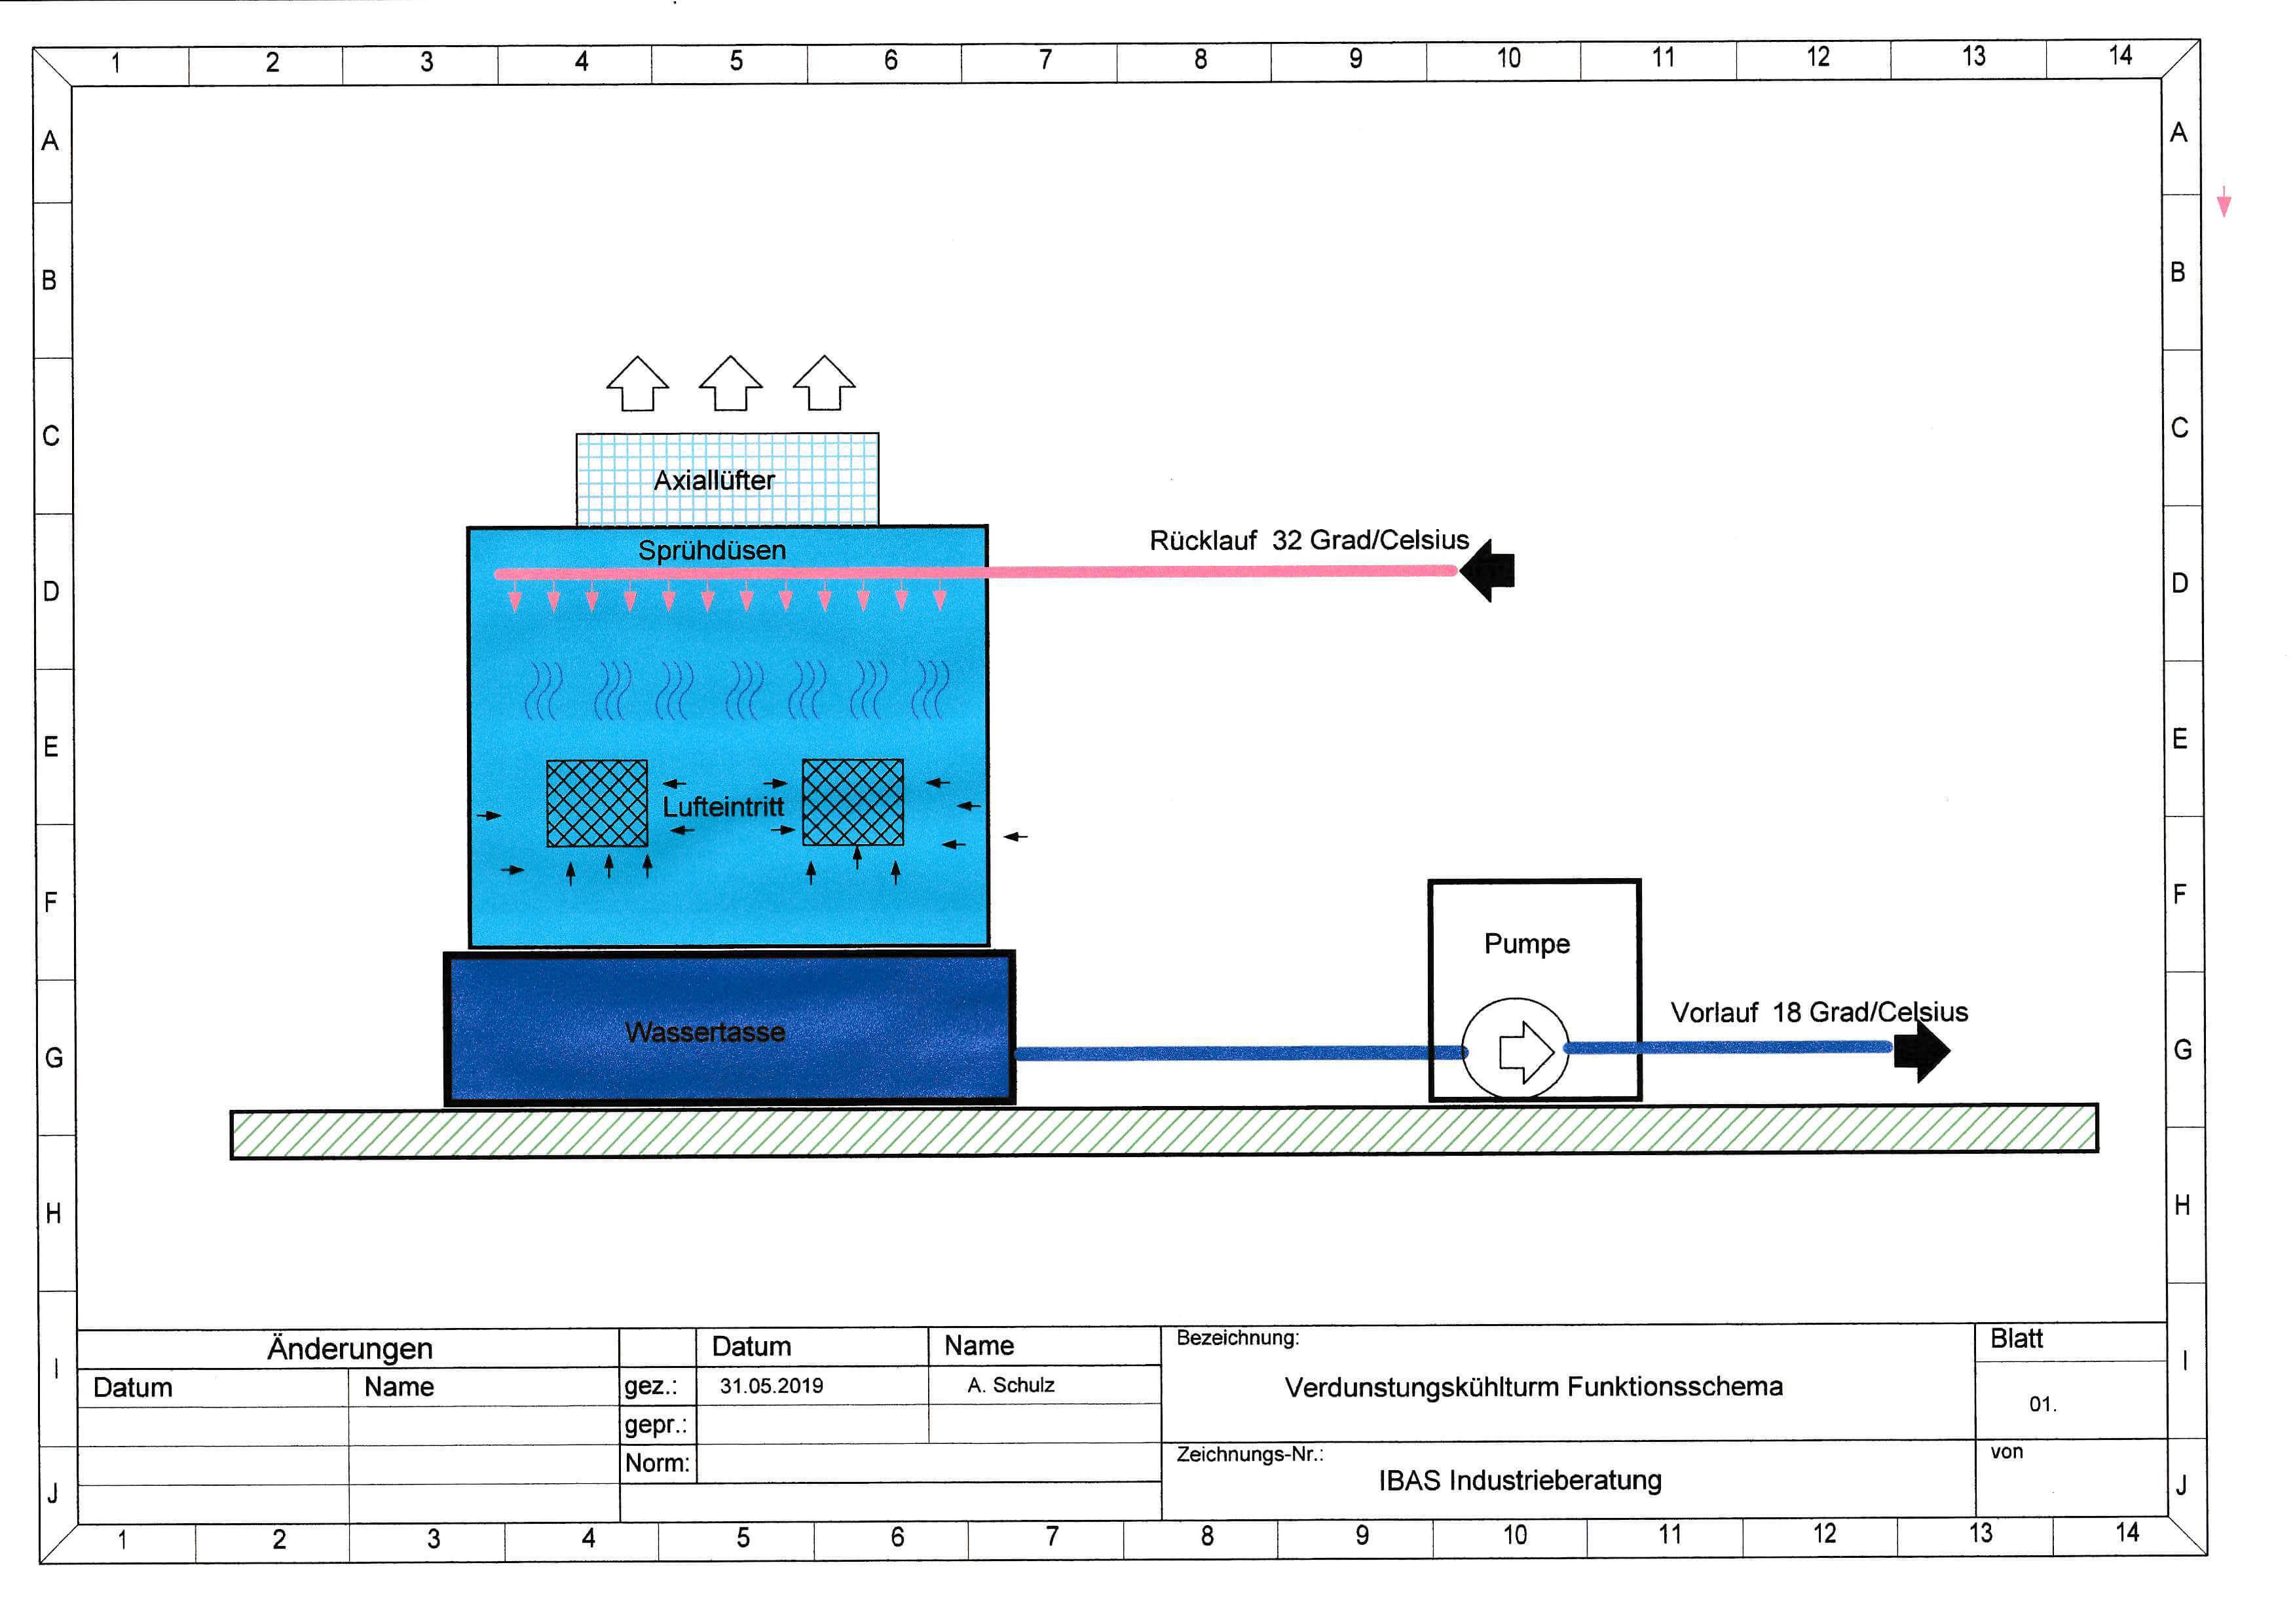 Verdunstungskühlturm | IBAS Industrieberatung Andreas Schulz